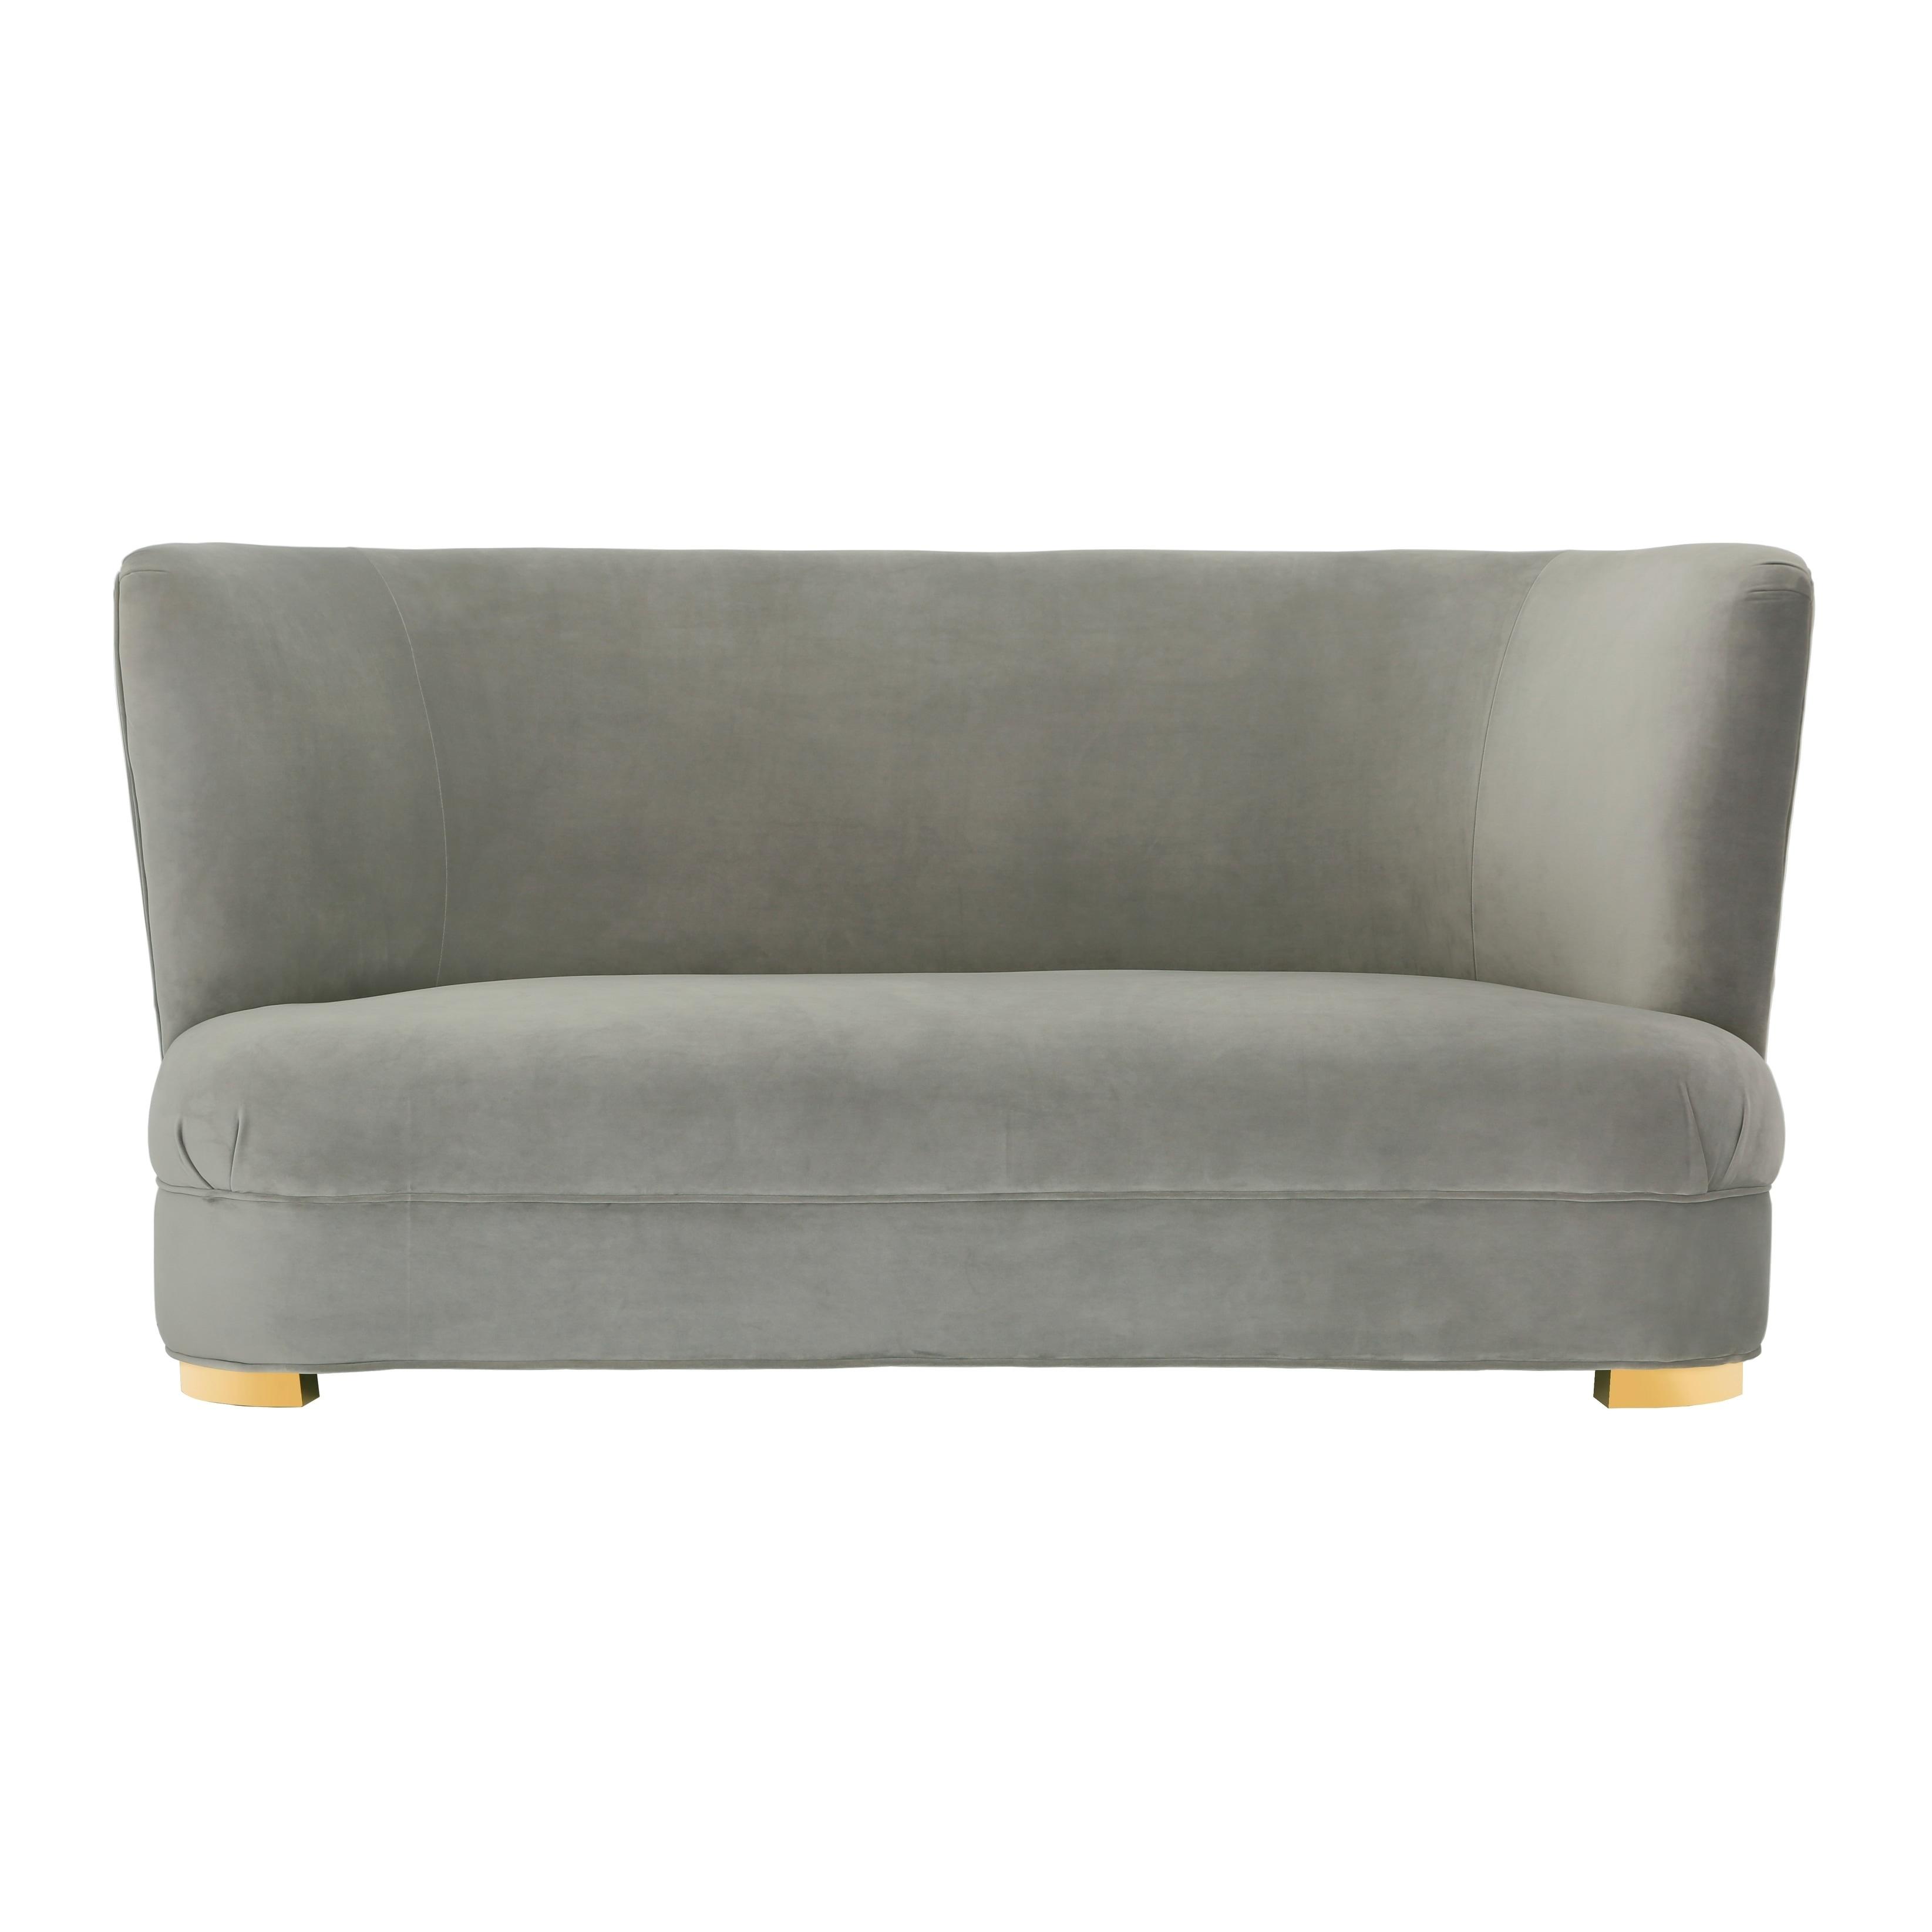 Ella Sofa Organic Modernism Furniture Sofas Ella Sofa